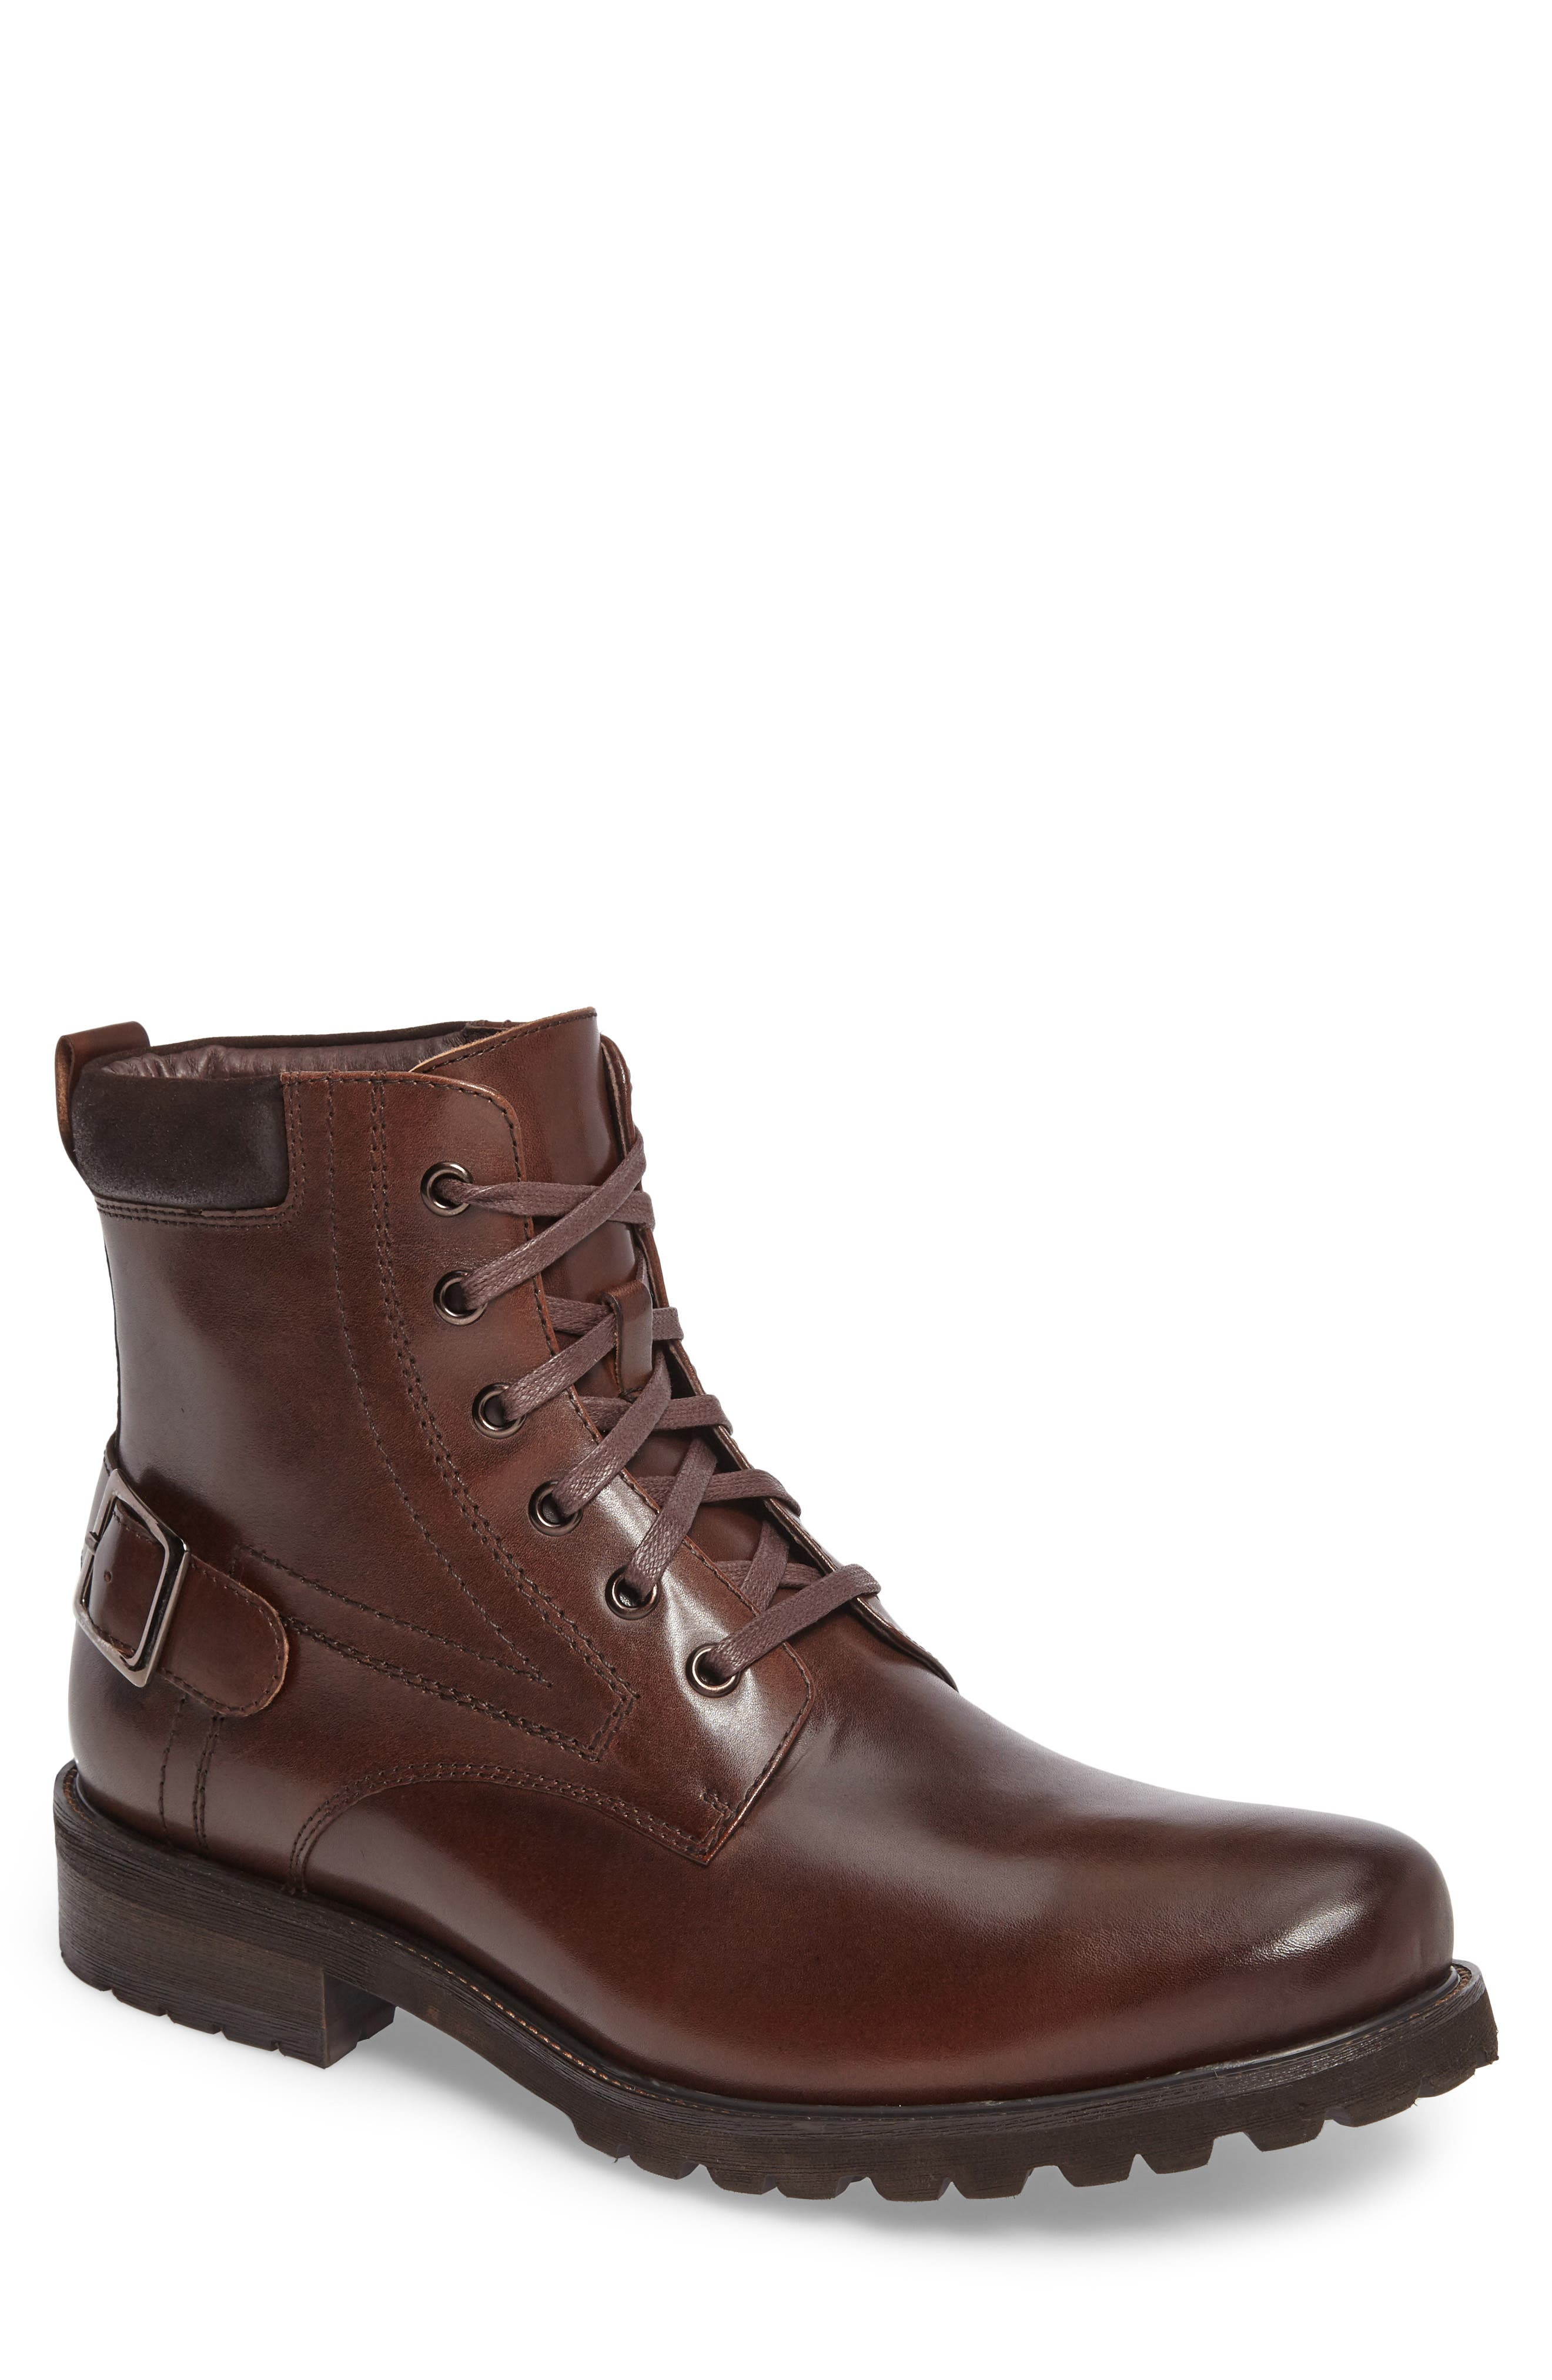 Keller Plain Toe Boot,                         Main,                         color, Brown Leather